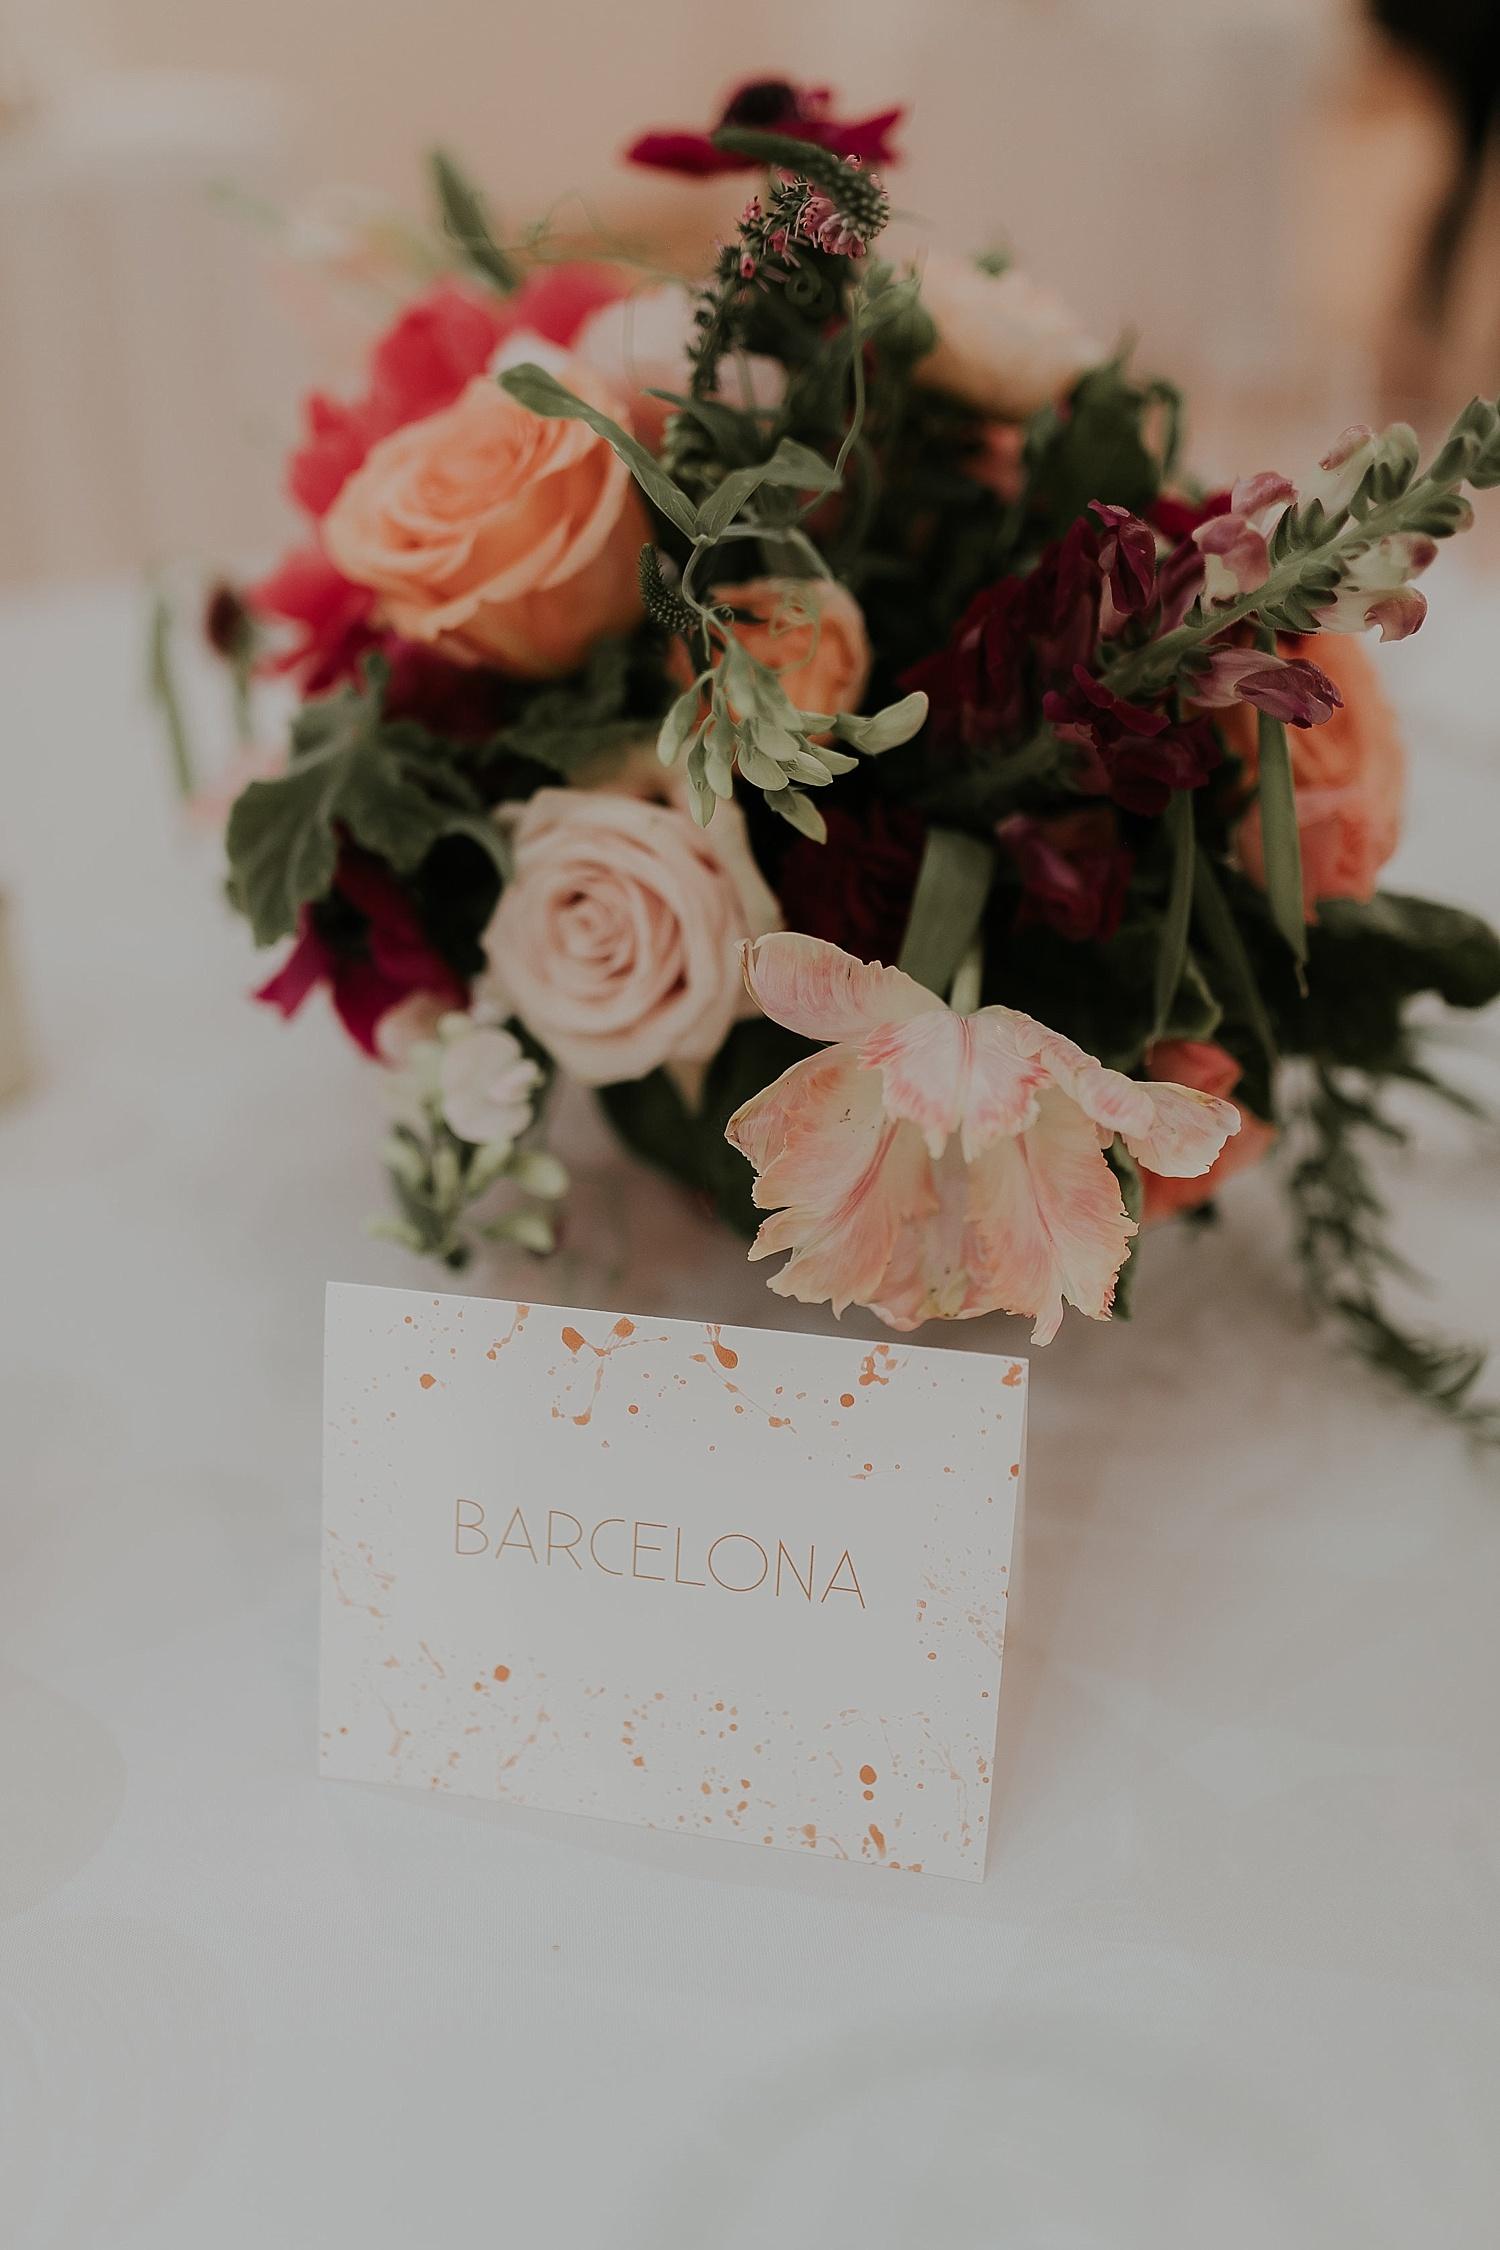 Alicia+lucia+photography+-+albuquerque+wedding+photographer+-+santa+fe+wedding+photography+-+new+mexico+wedding+photographer+-+gerald+peters+gallery+wedding_0031.jpg